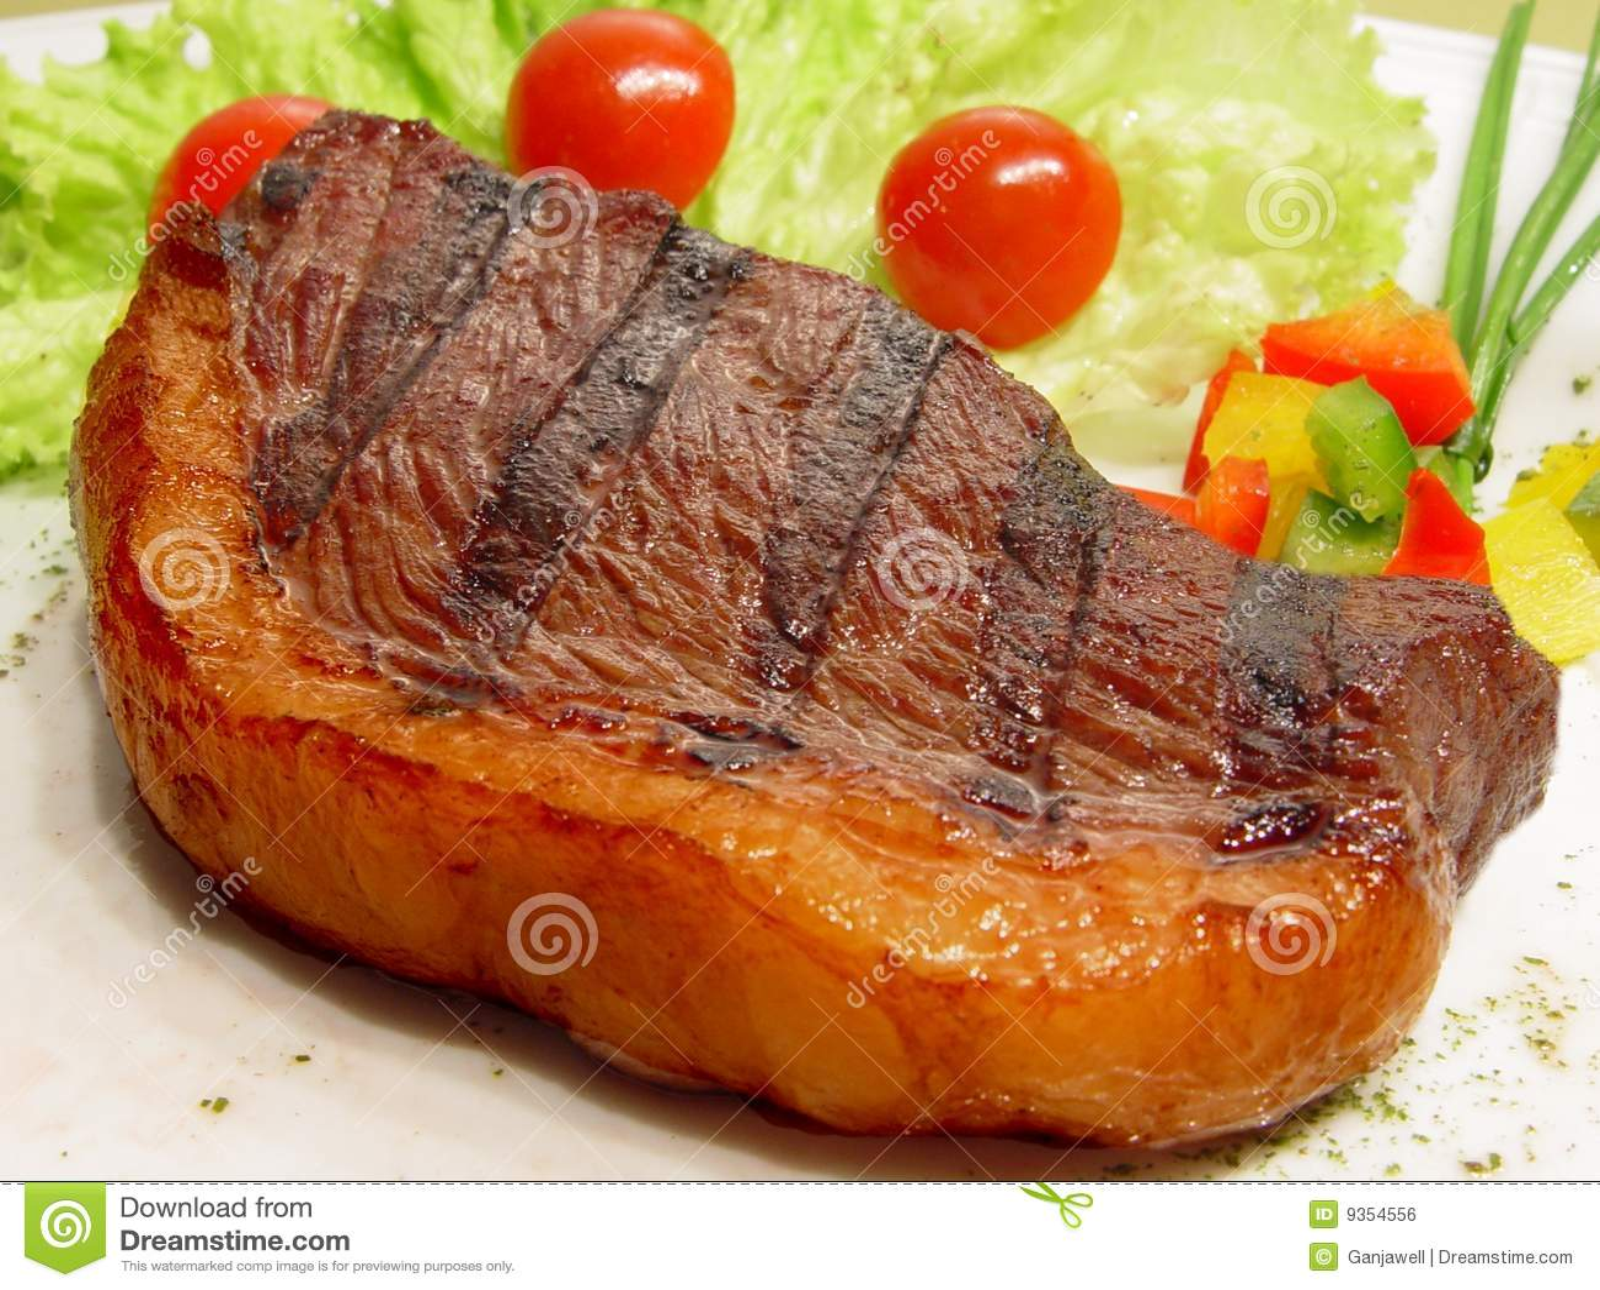 Picanha, Tapa de Cuadril, Steak with salad